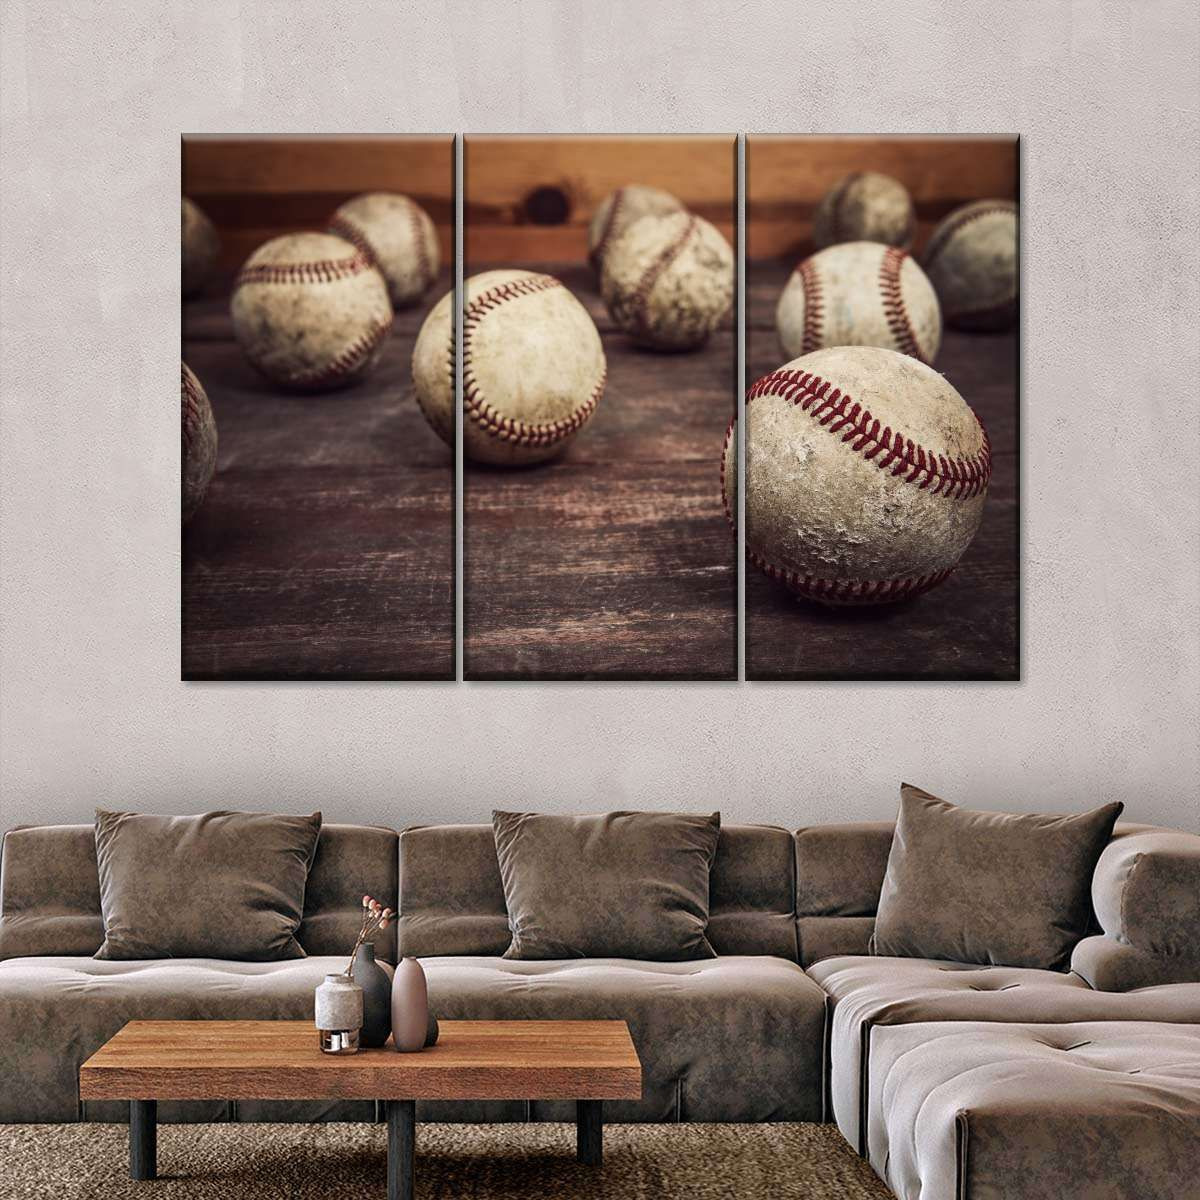 Vintage Baseball Collection Multi Panel Canvas Wall Art In 2021 Vintage Baseball Room Baseball Wall Decor Vintage Baseball Decor